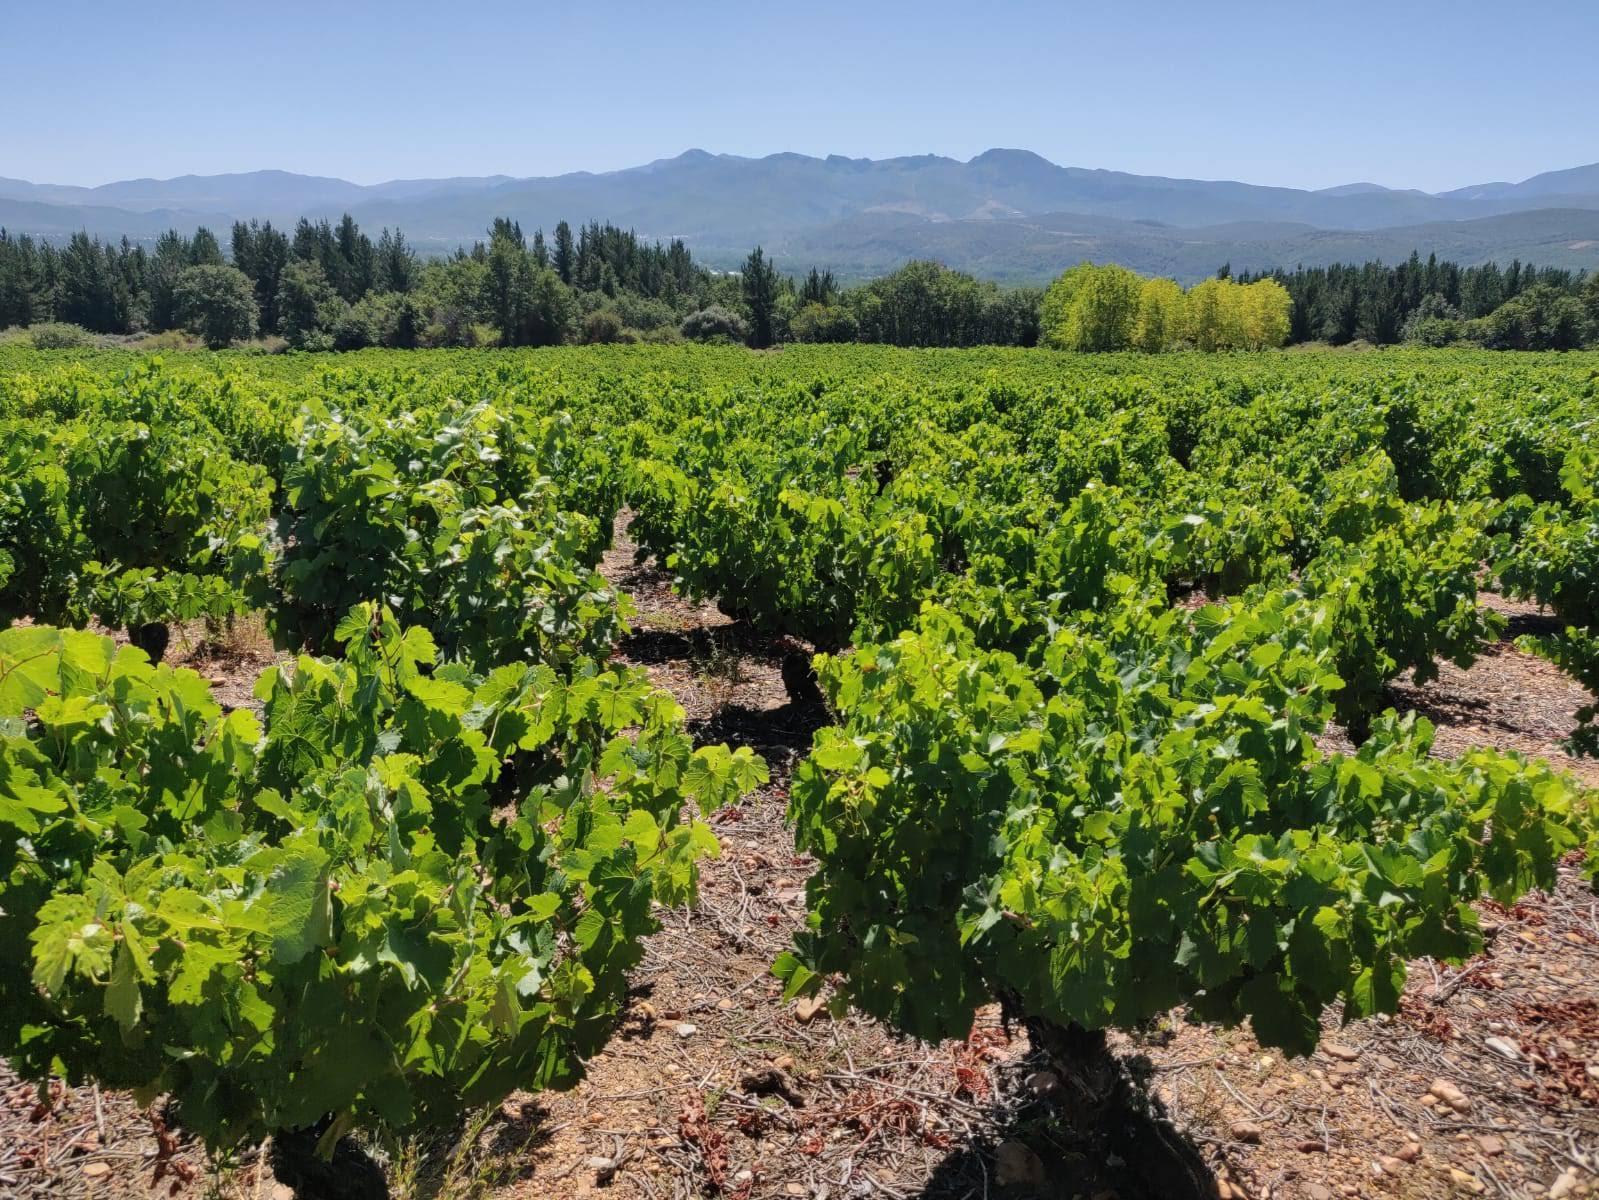 Bodega Y Vinedos Hija De Anibal - Vineyards